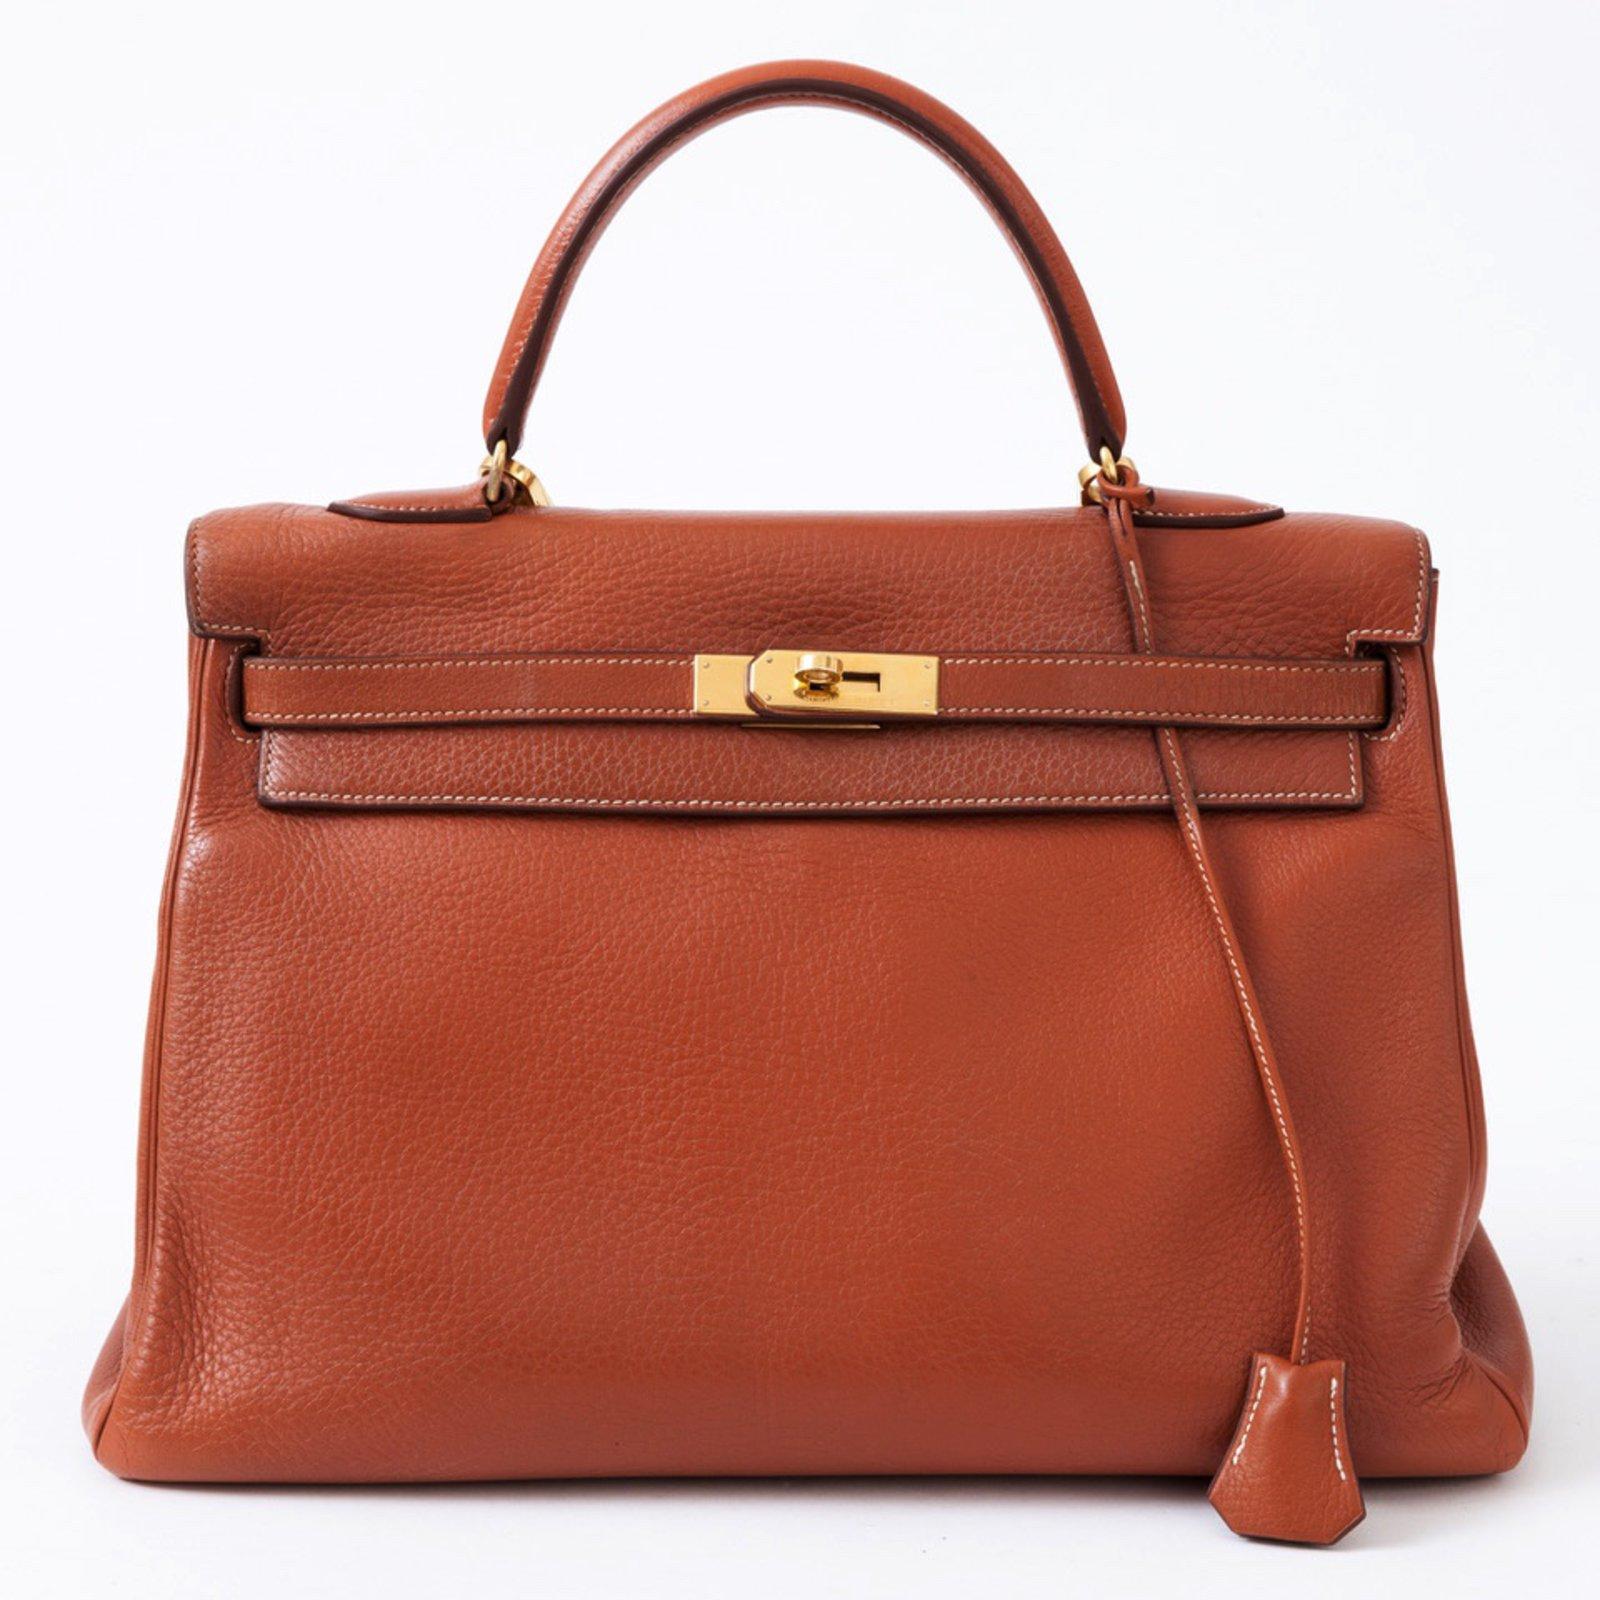 Hermès 35 Cuir En Sacs Bandoulière Main Camel Sac À Kelly 2WDYeE9HI